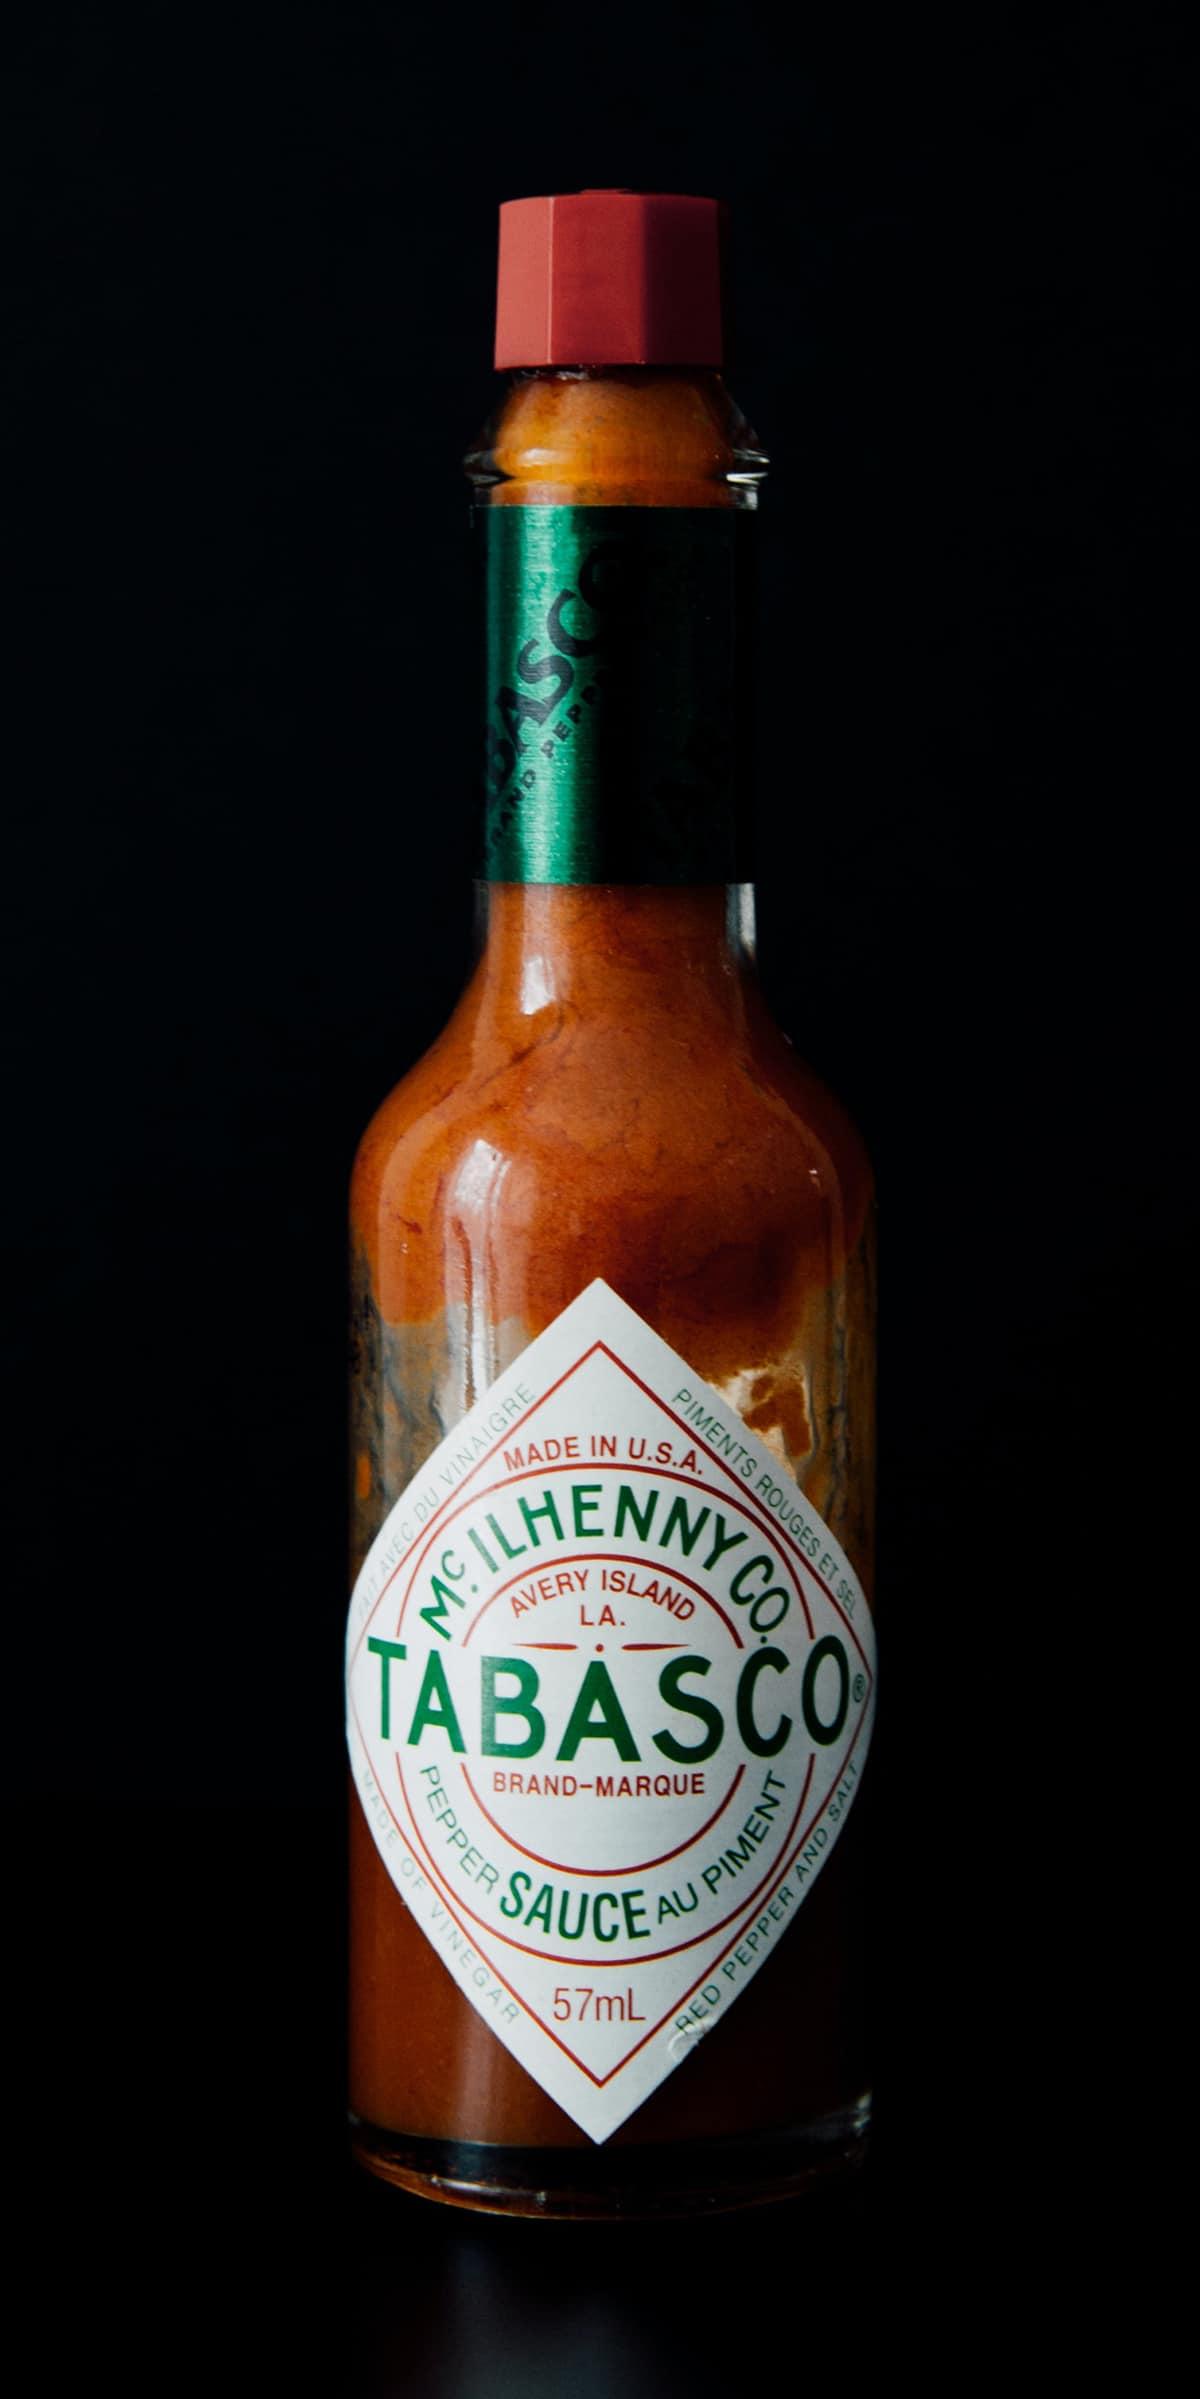 bottle of tabasco sauce with dark background